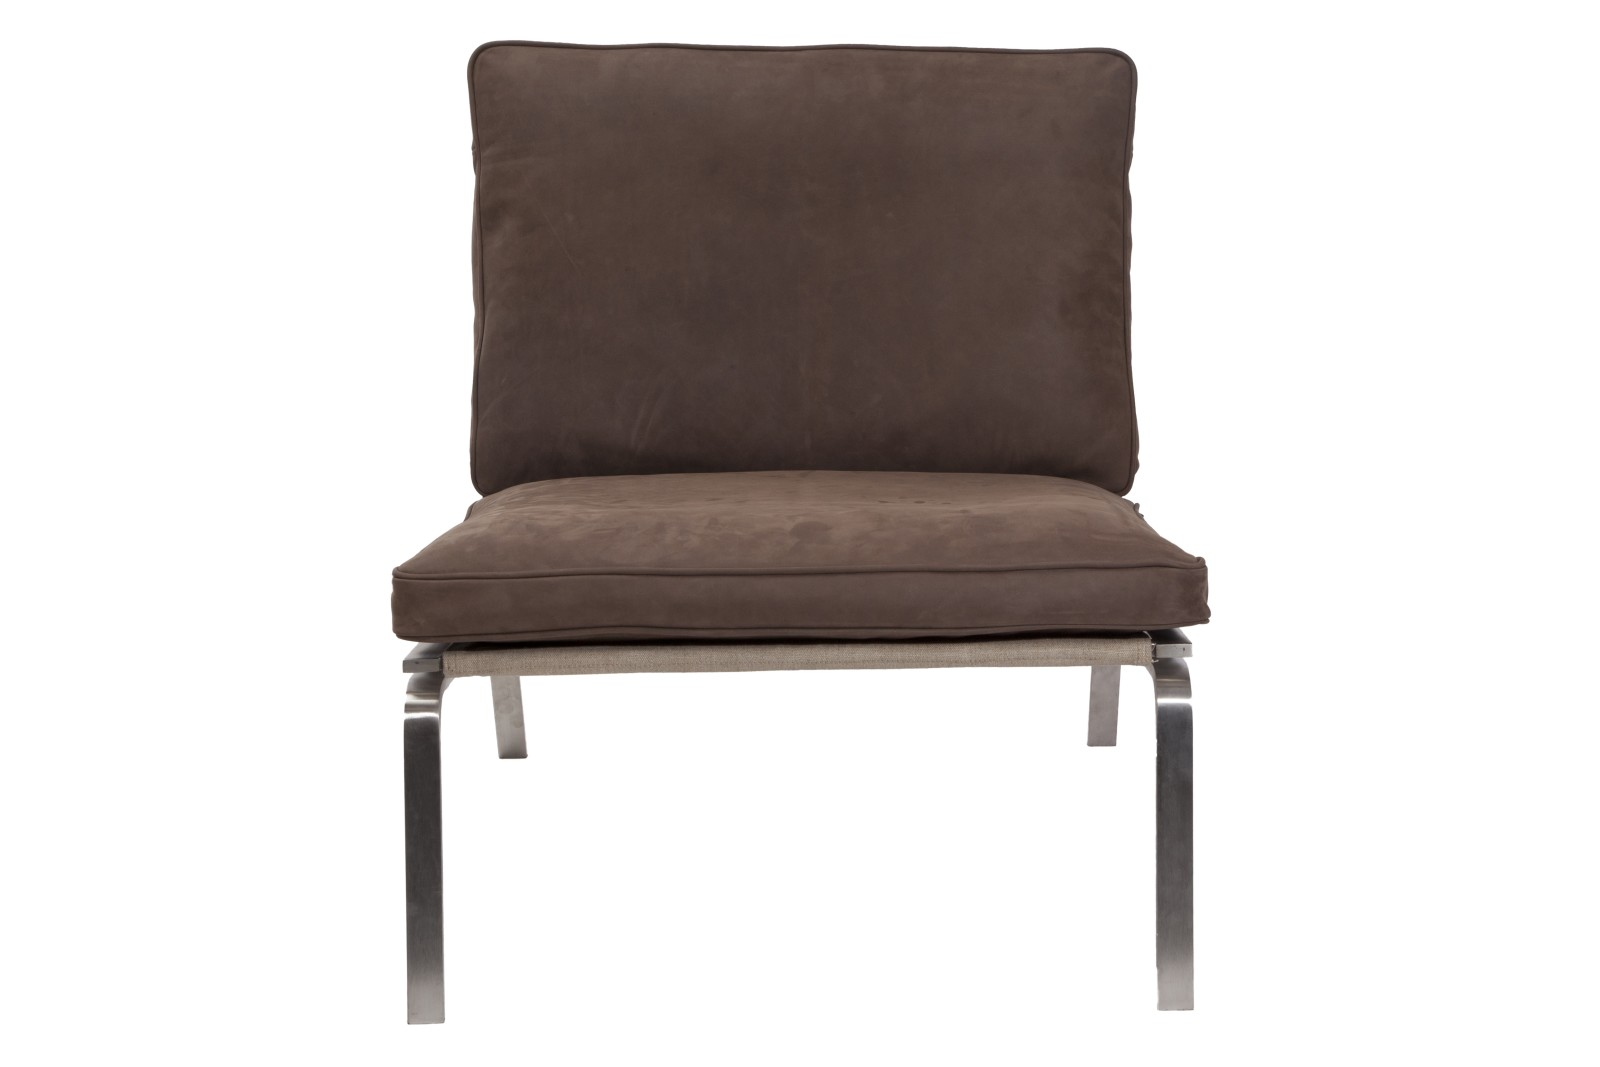 Man Lounge Chair Dark Brown Vintage Leather